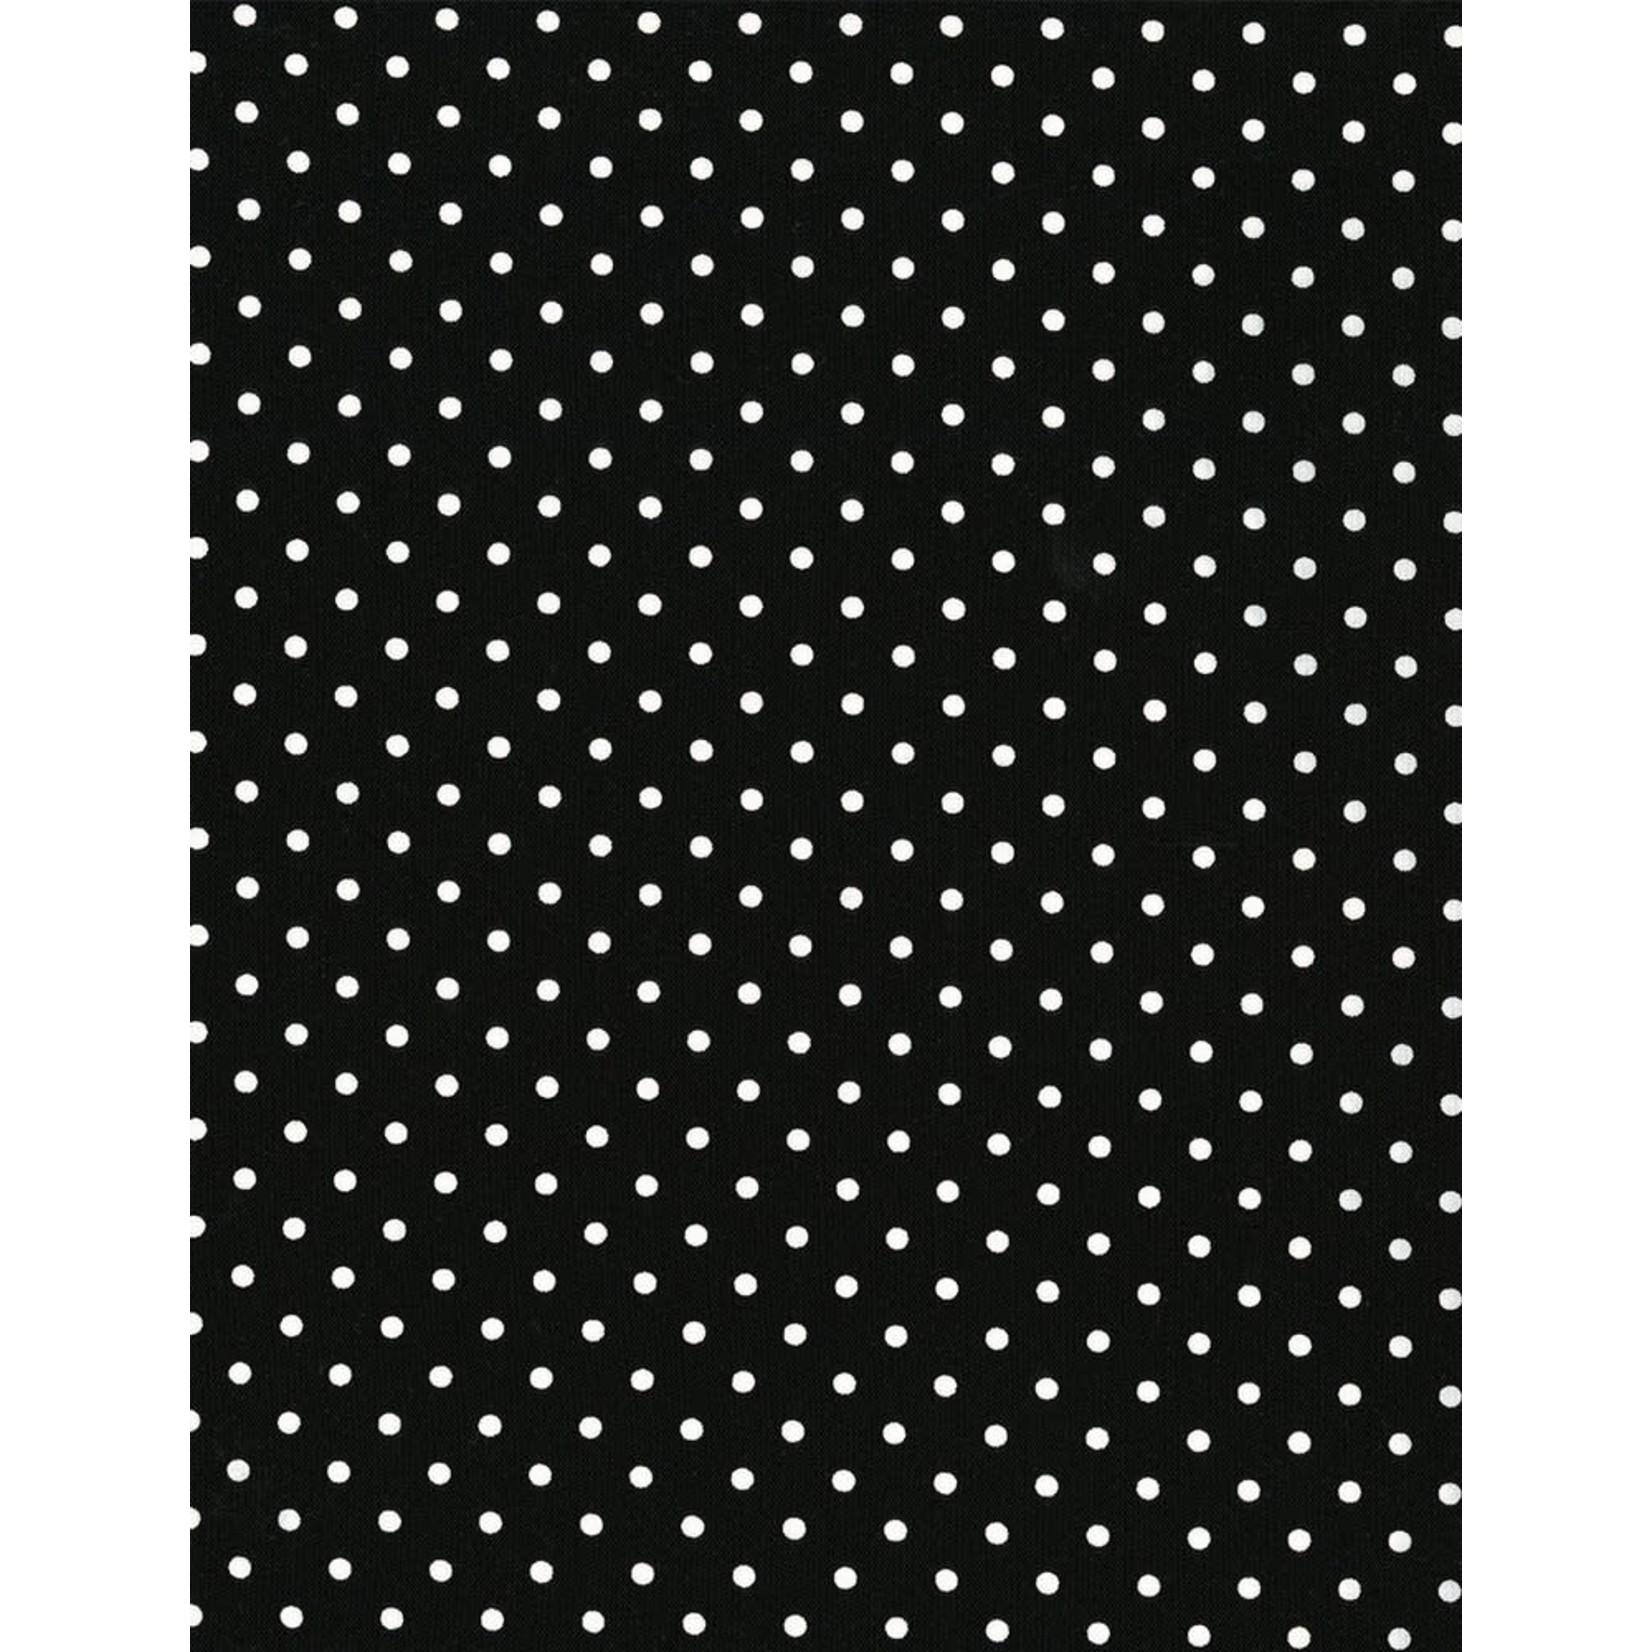 Timeless Treasures Dot, Black (DOT-1820-BLACK) $0.20 per cm or $20/m